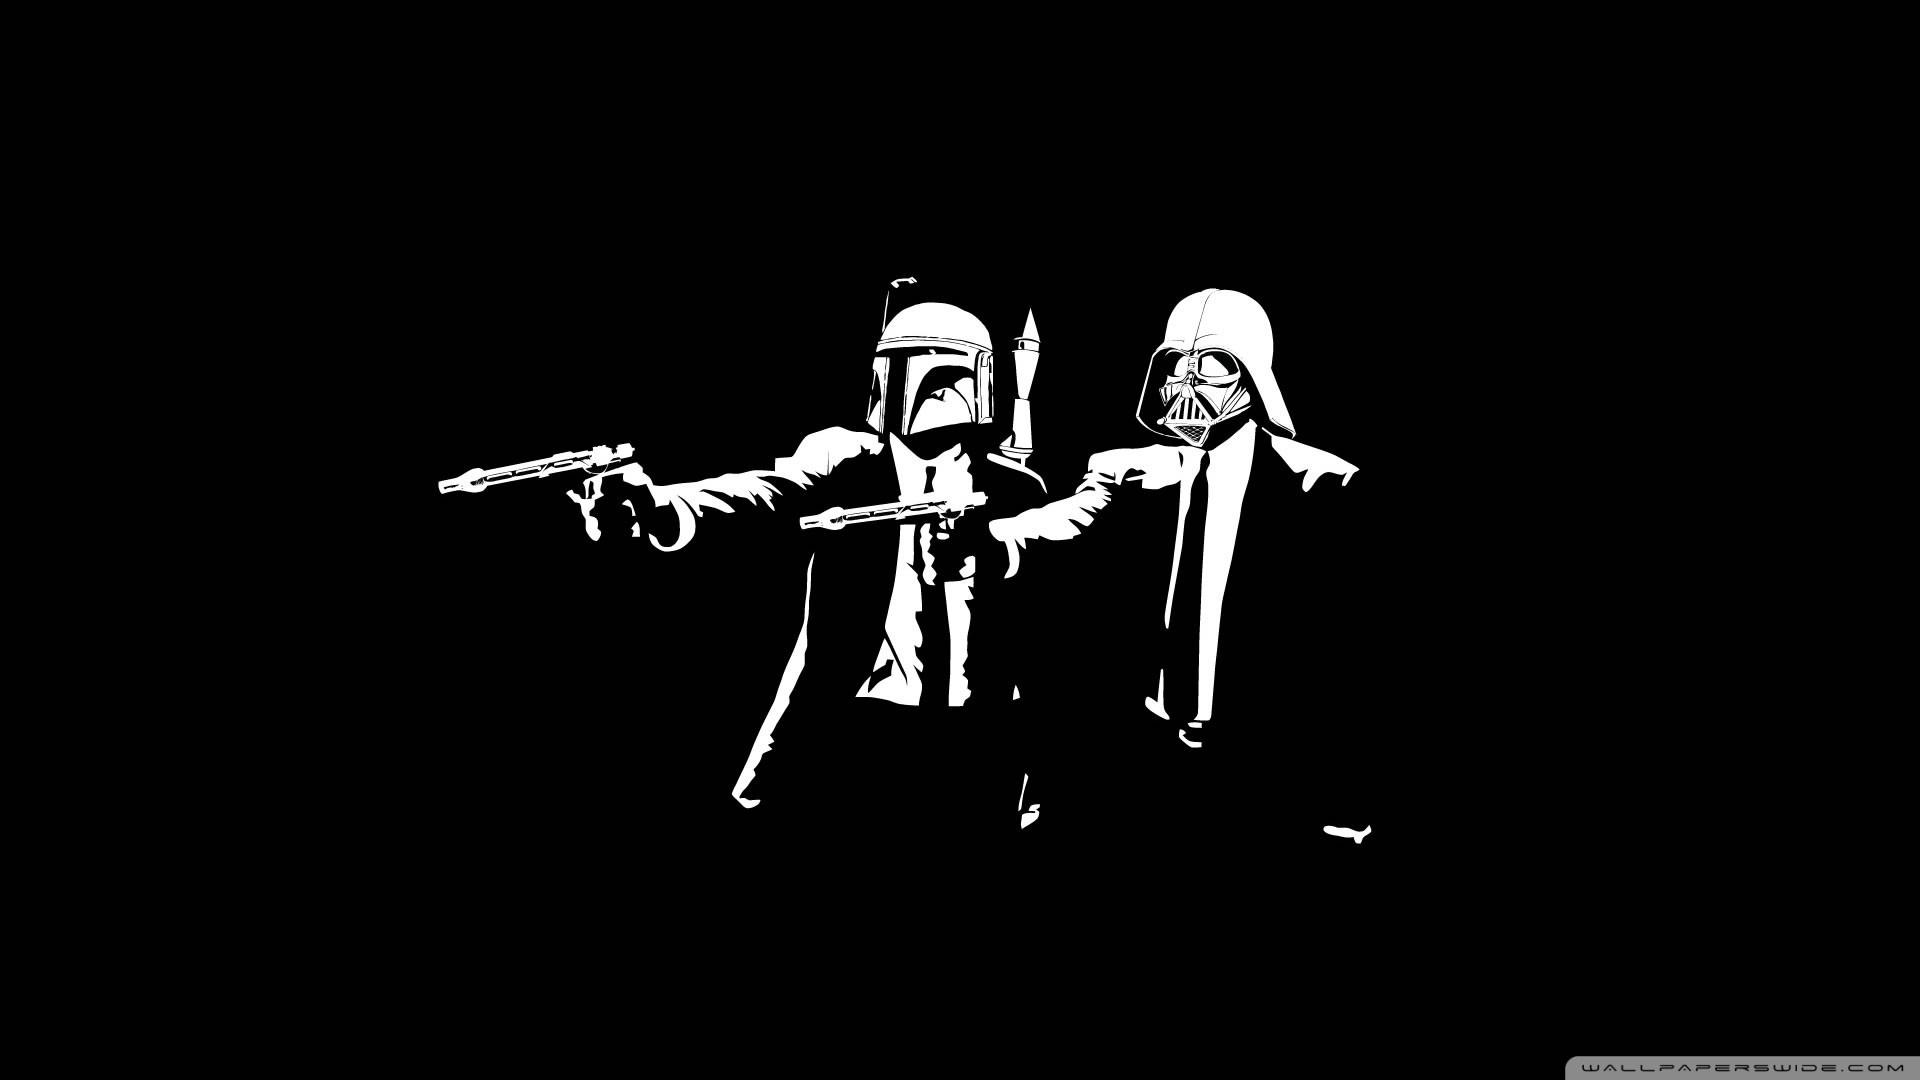 Star Wars Pulp Fiction Wallpaper 57 Images